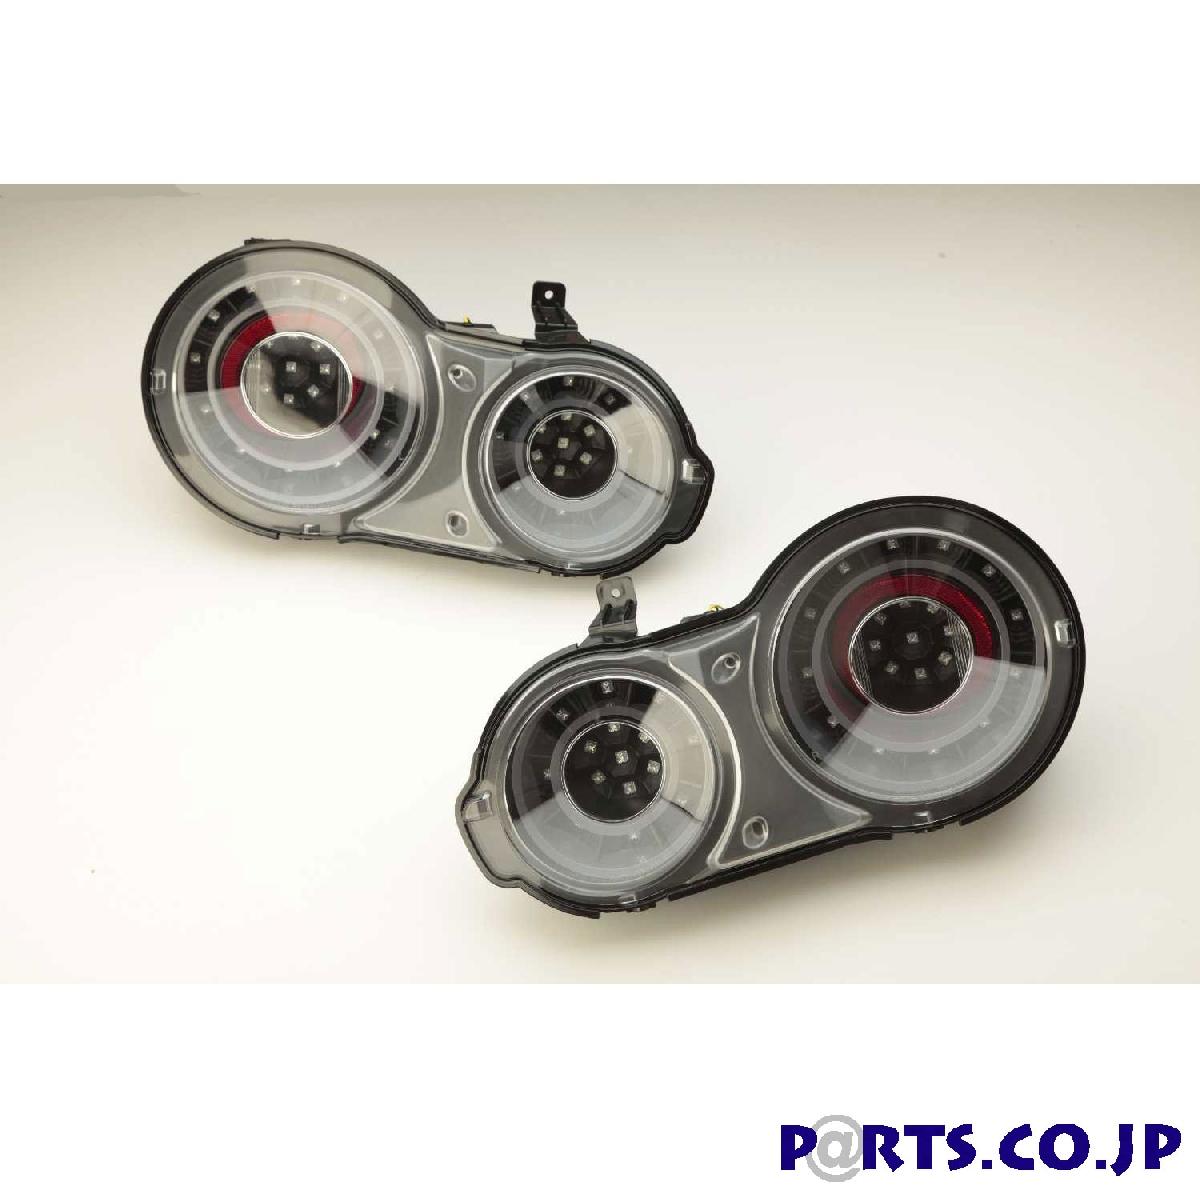 LED R35 テールライト テールライト オールモデル SONAR(ソナー) GT-R ブラック GT-R ニッサン 2007~ 日産